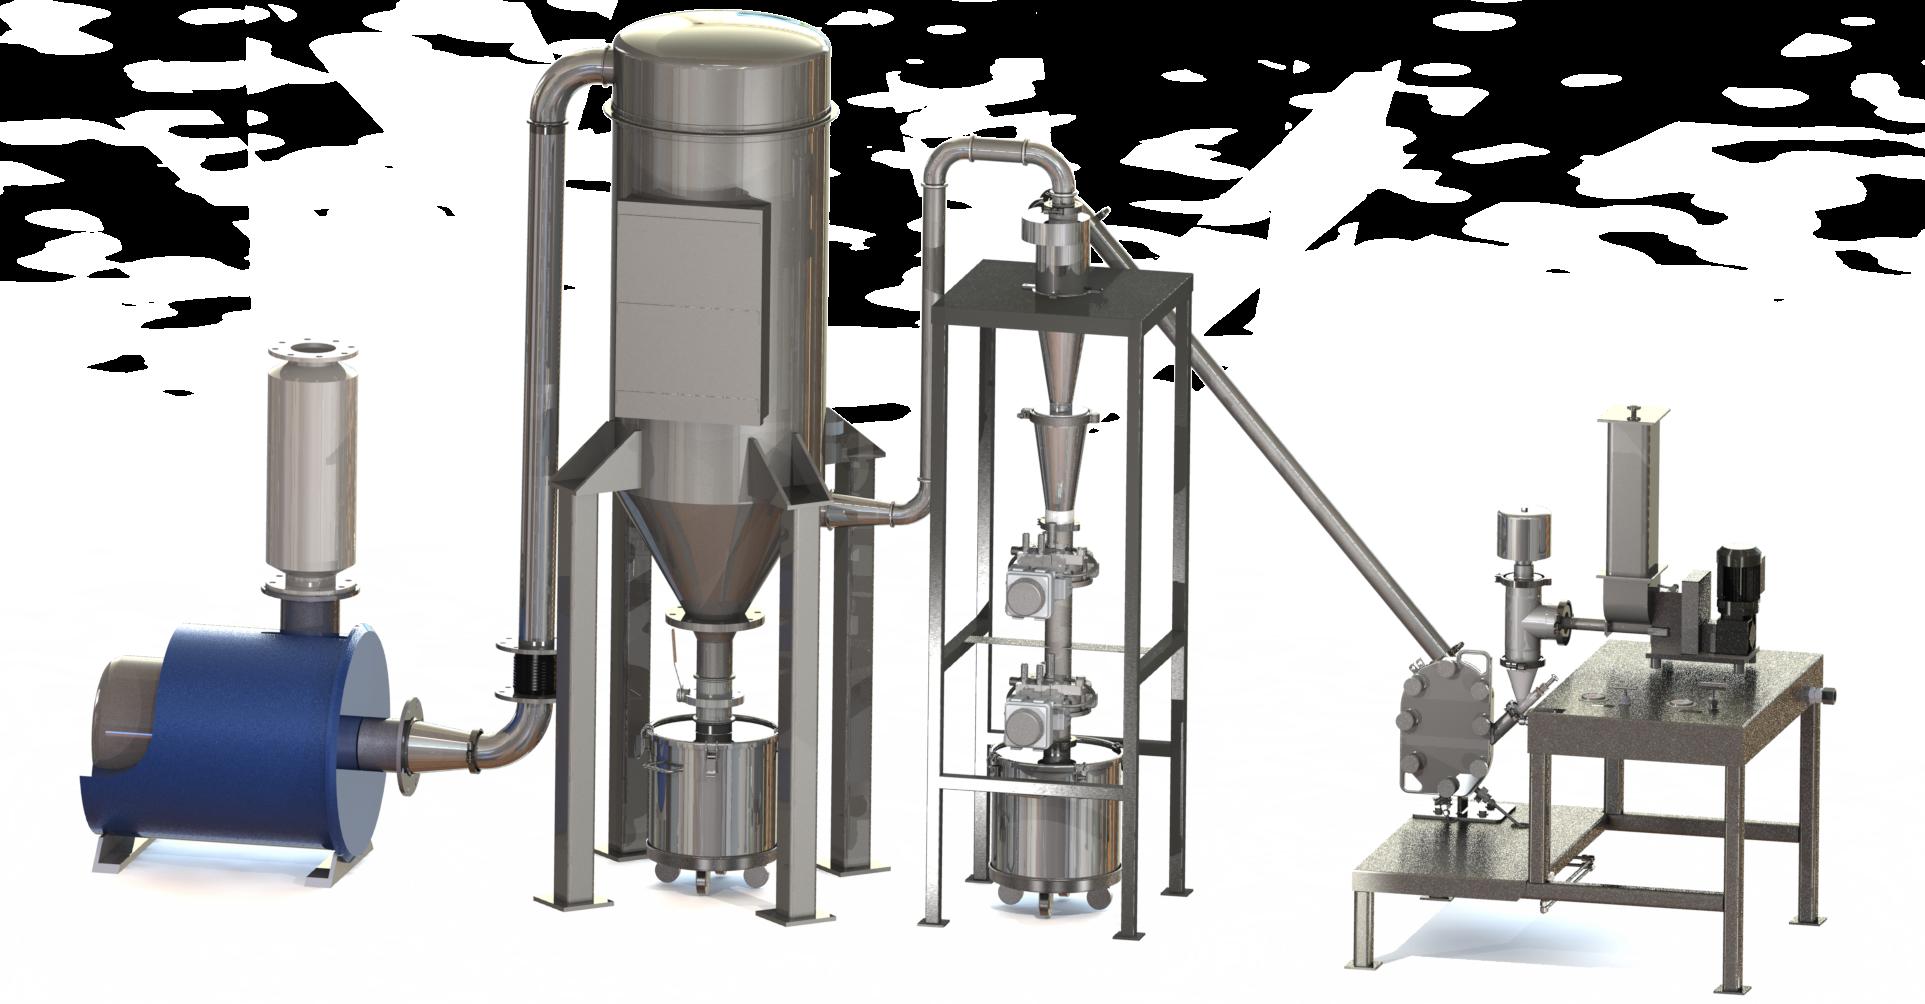 Jet-O-Mizer System